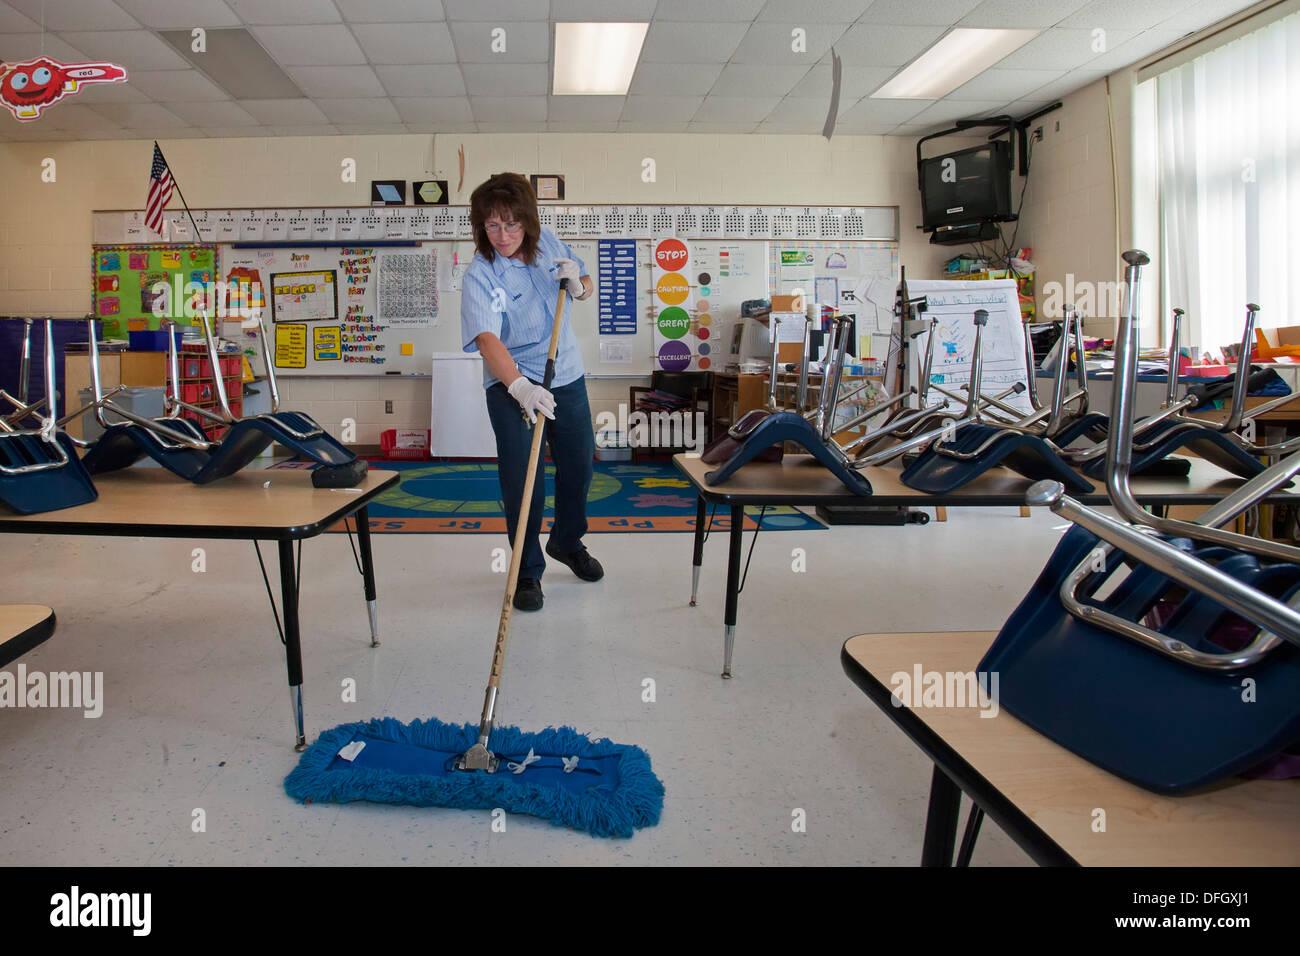 Classroom clipart custodian, Picture #366146 classroom clipart custodian